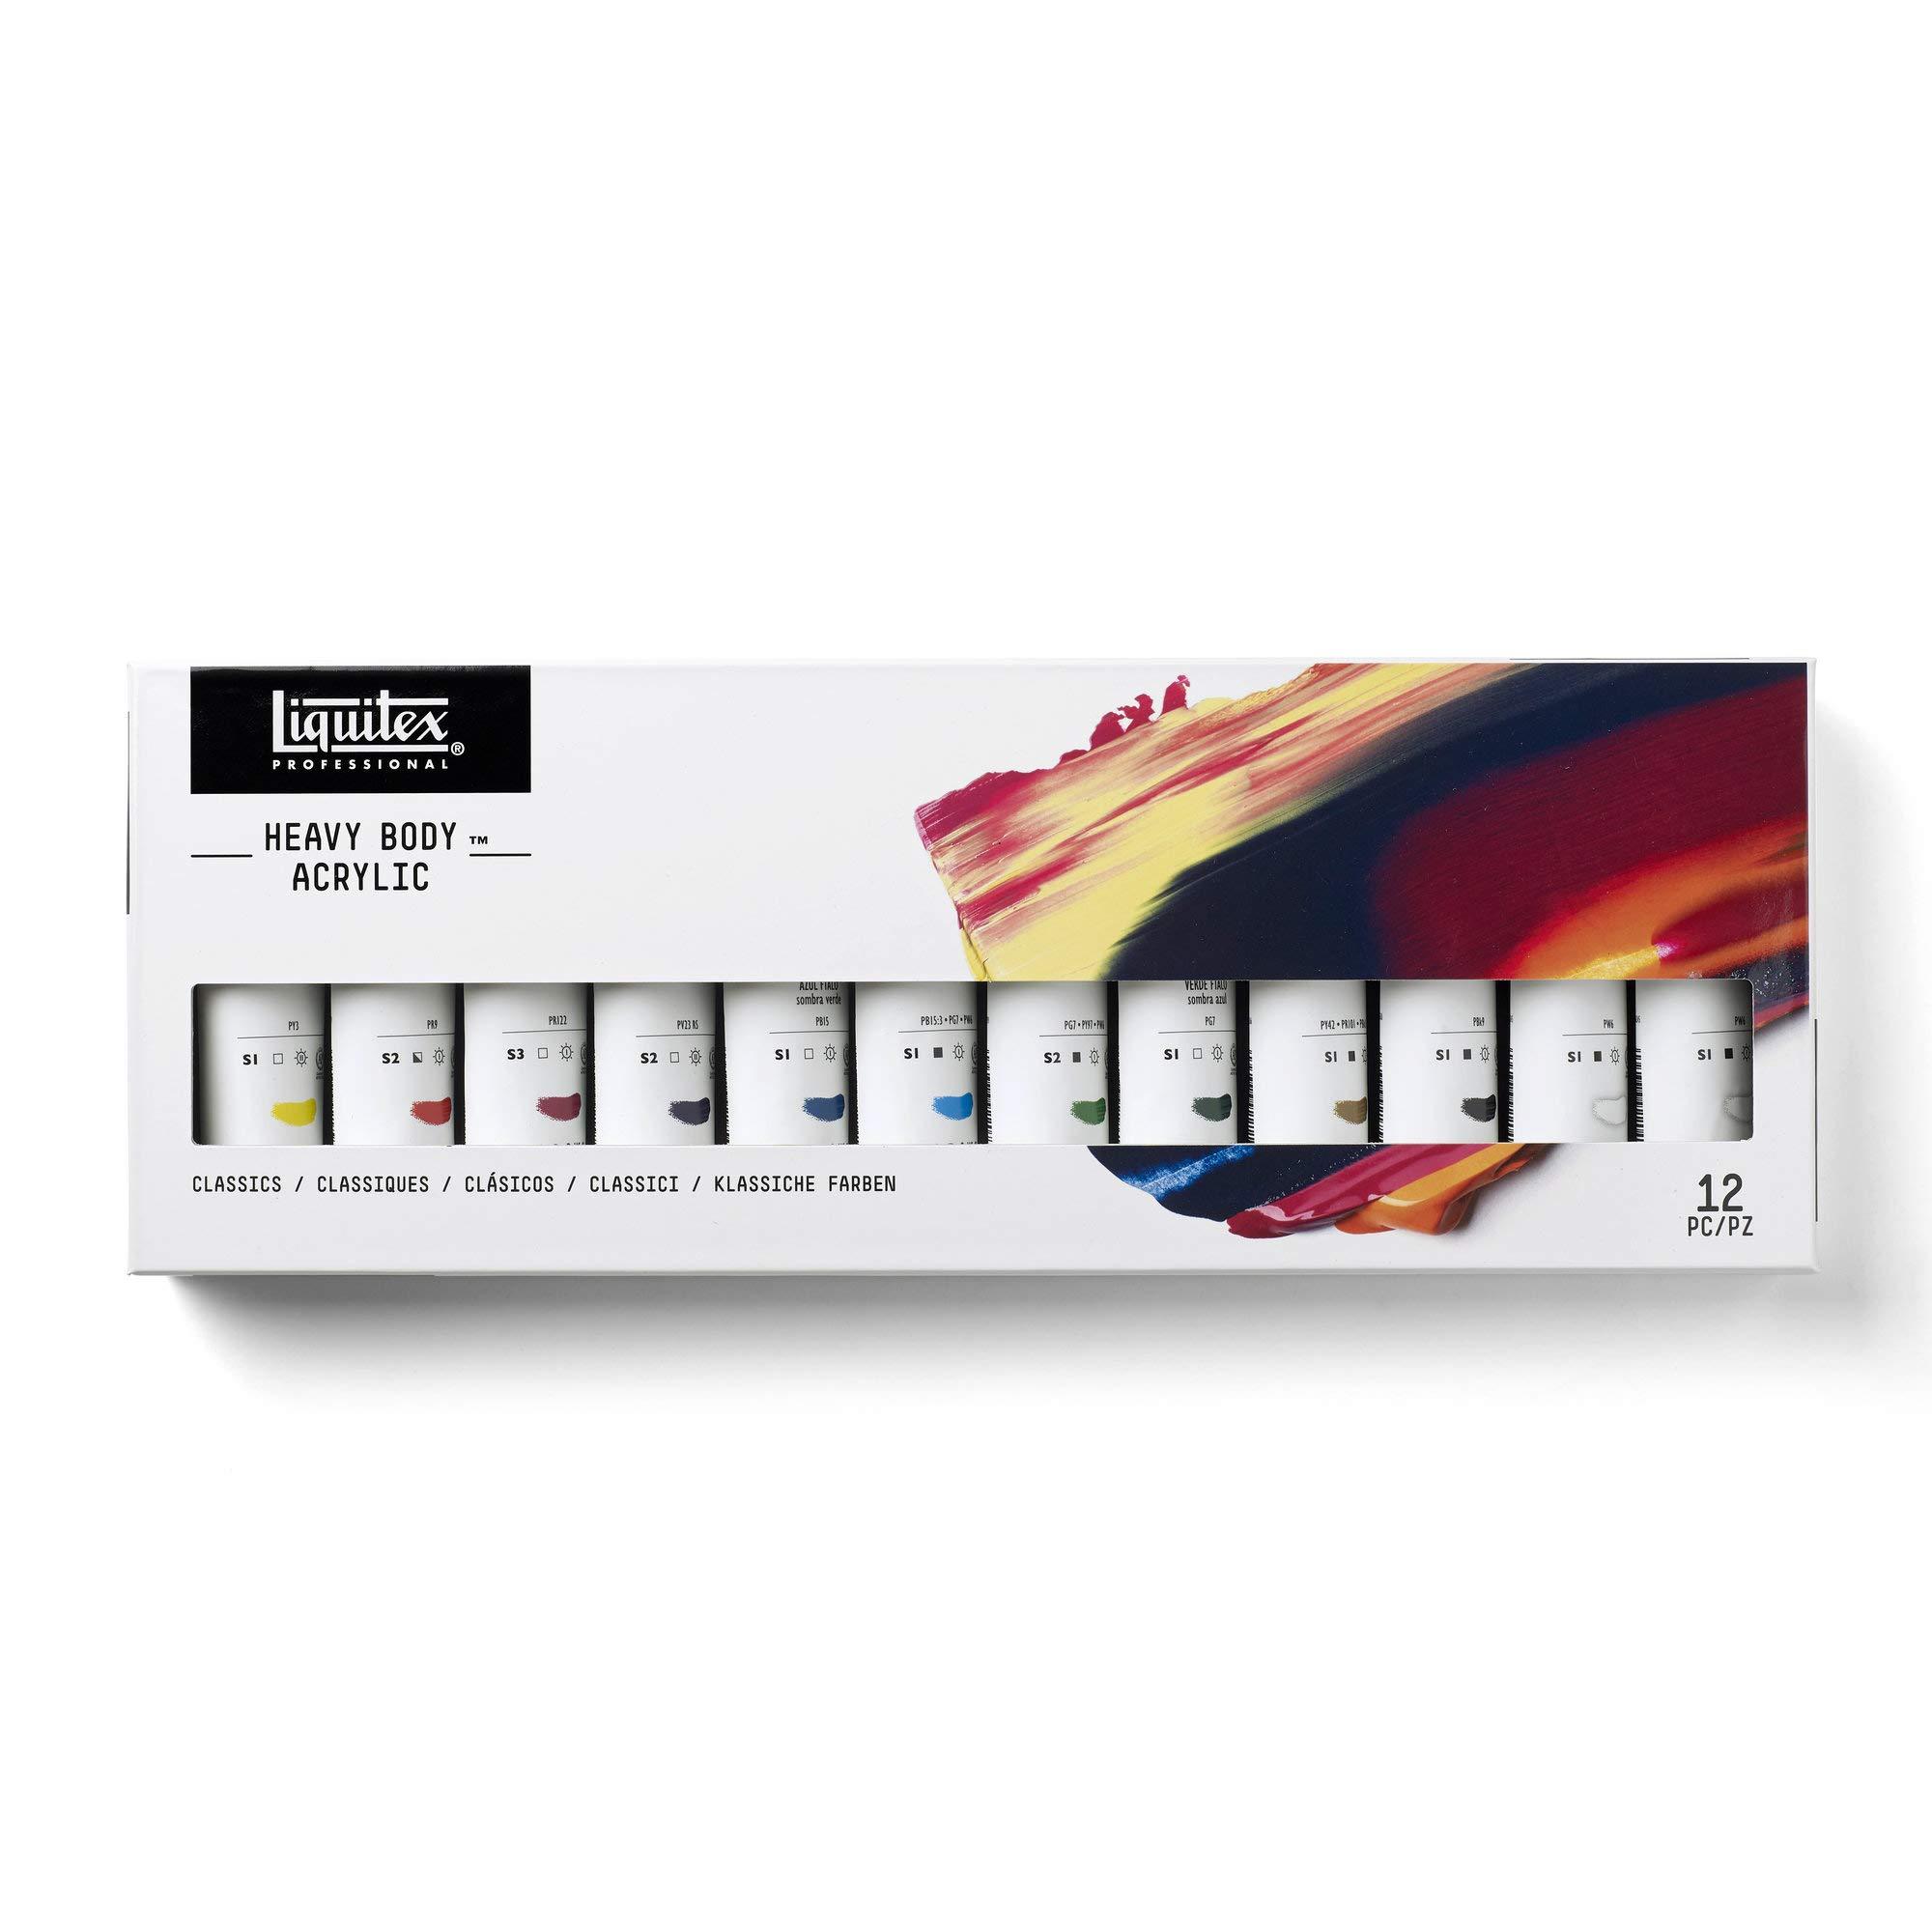 Liquitex Professional Acrylic Classic Colors